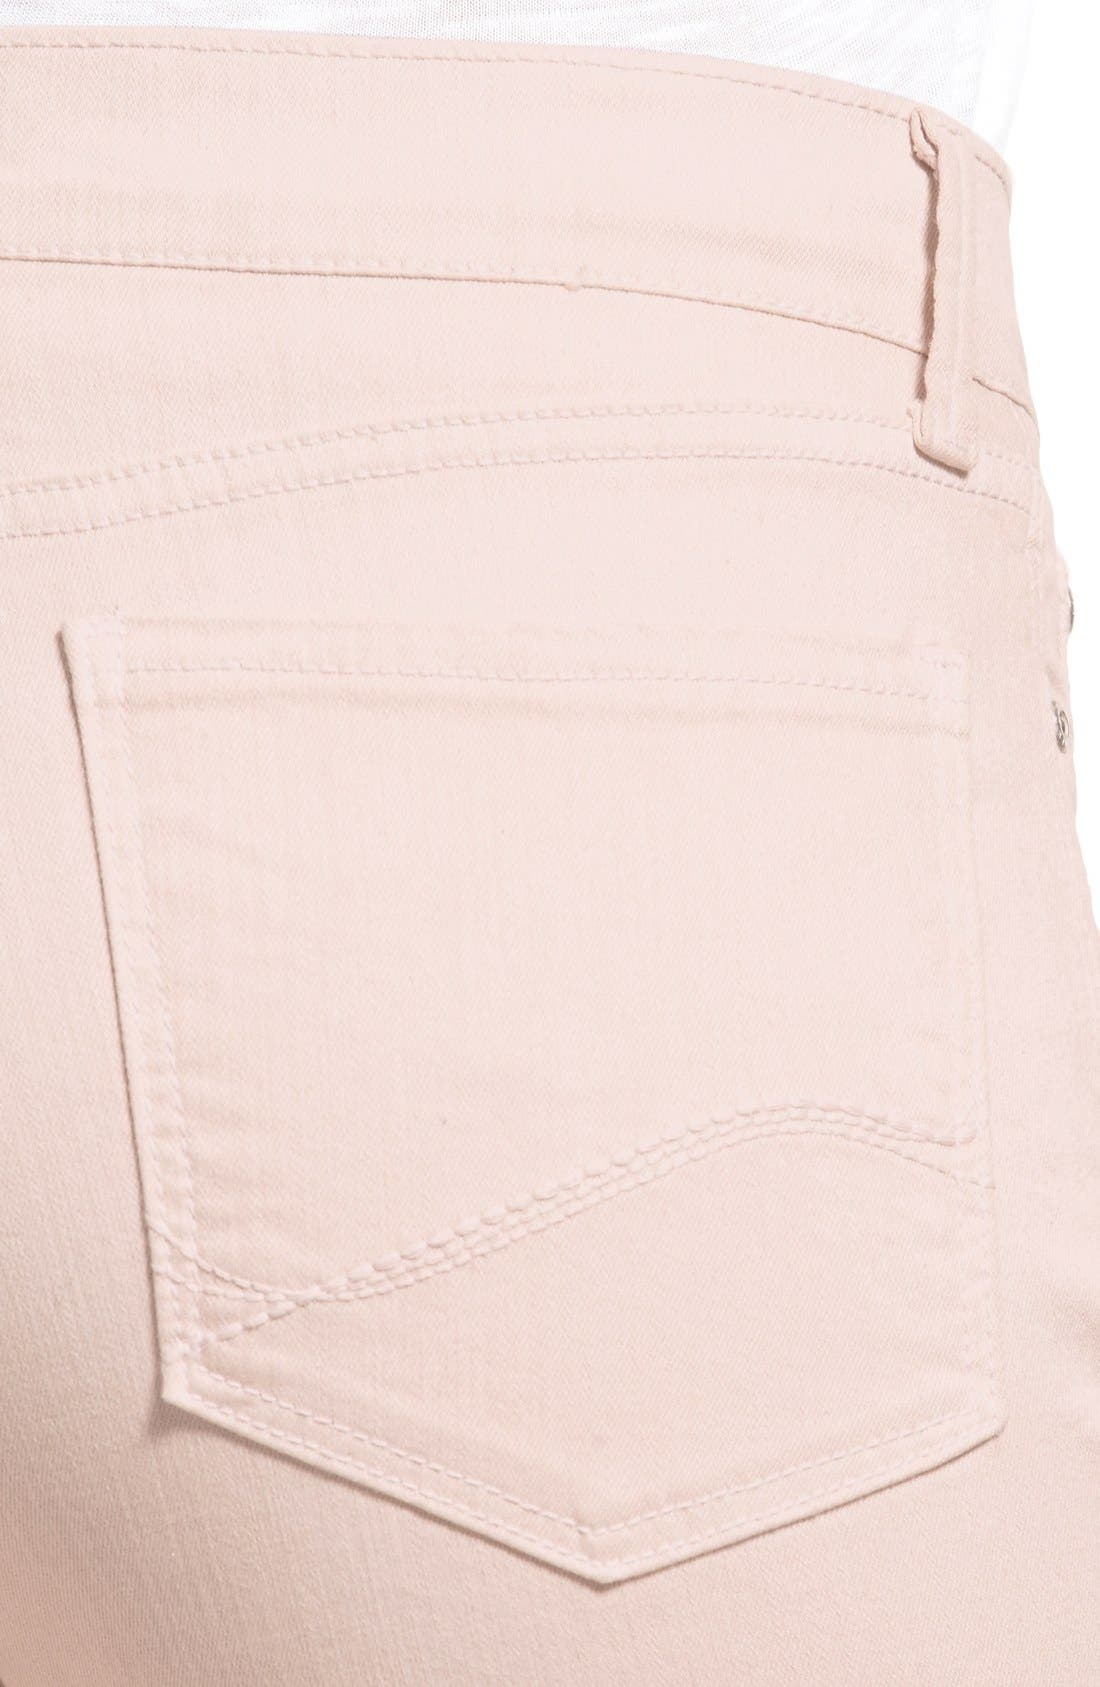 'Dayla' Colored Wide Cuff Capri Jeans,                             Alternate thumbnail 70, color,